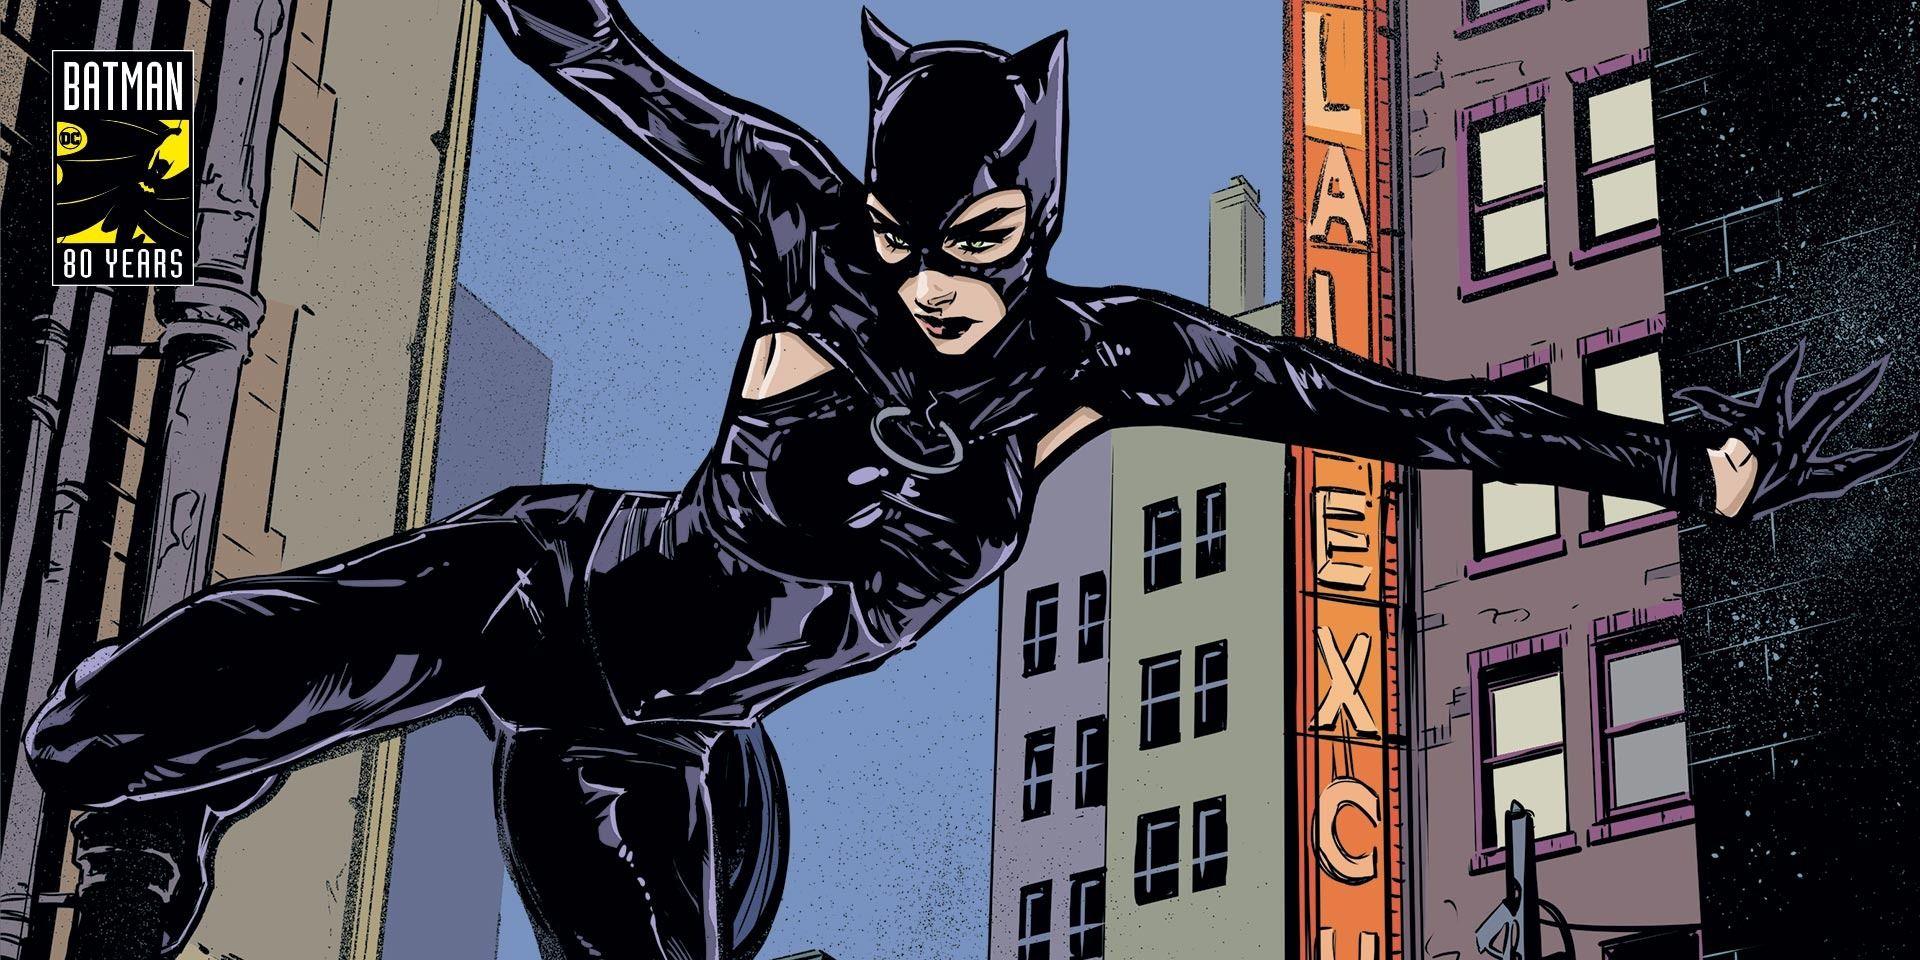 Stepdad Jason Momoa Weighs In on Zoe Kravitz's Catwoman Casting